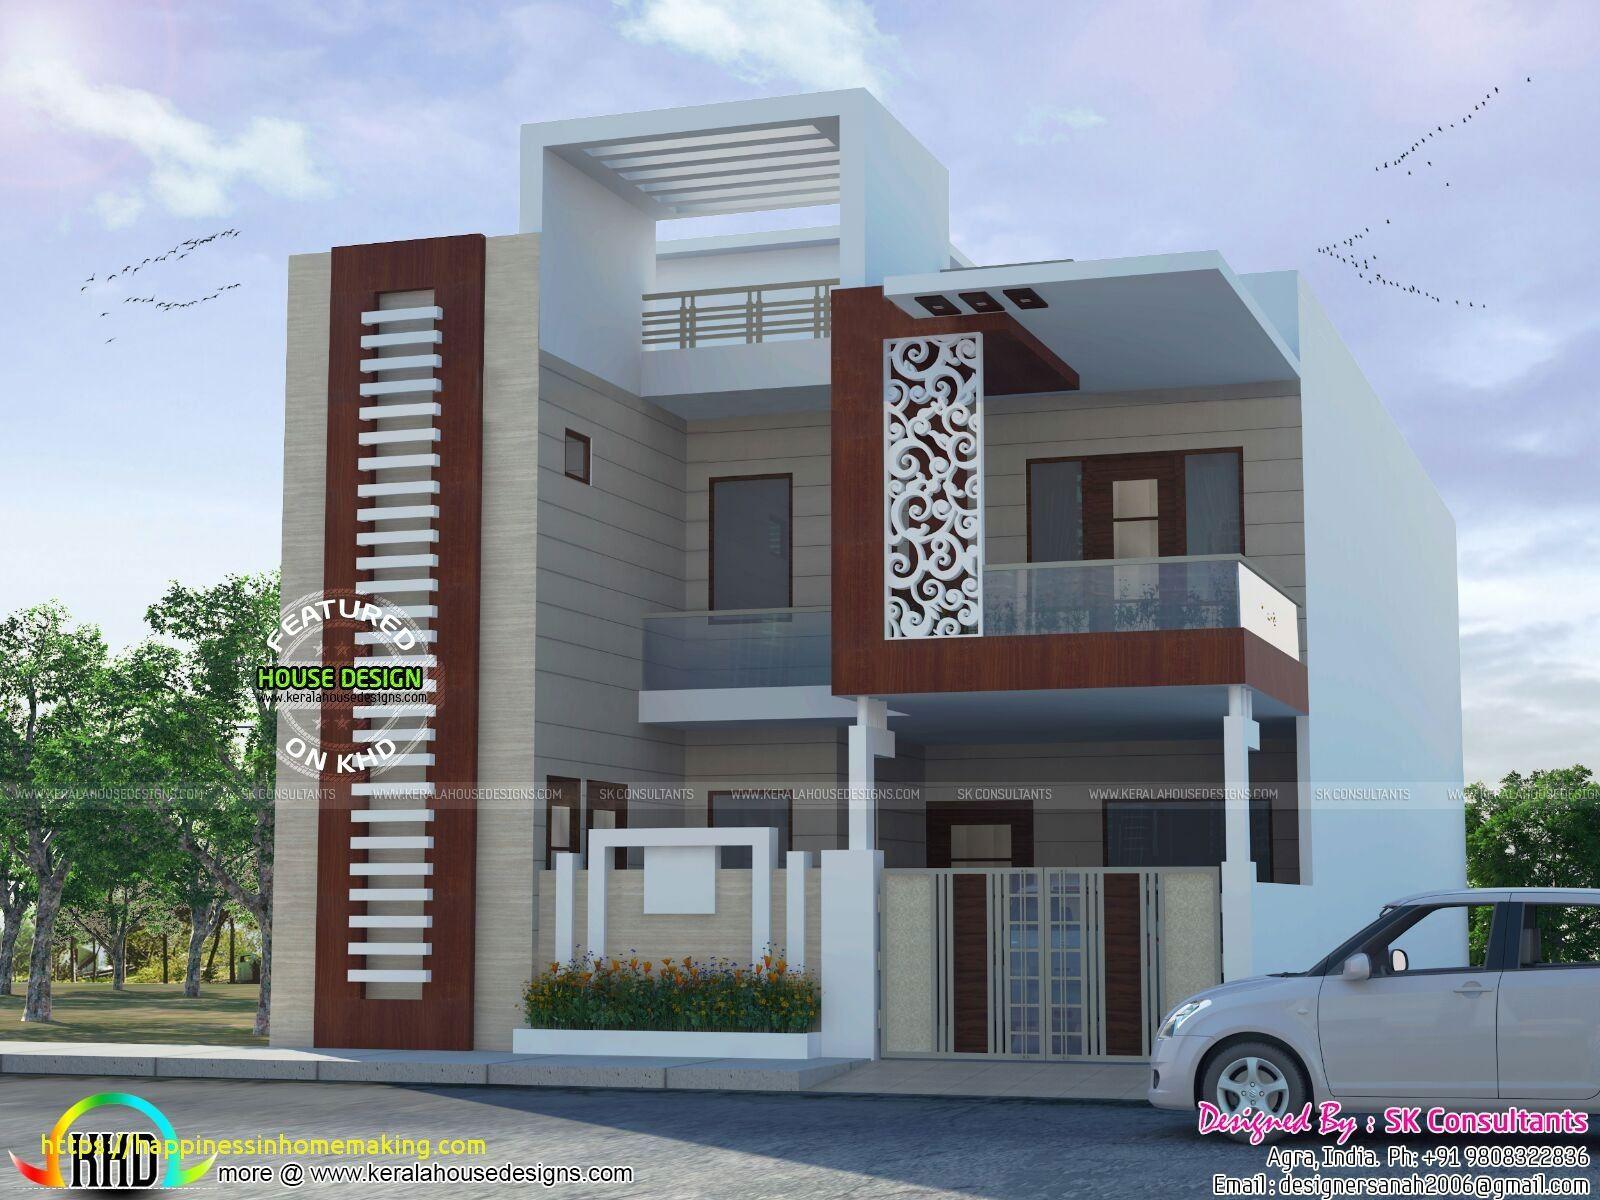 Indian House Exterior Design Ideas Cheap Houses For Rent Near Me Exteriordesign Exterior Kerala House Design Modern House Exterior Front Elevation Designs